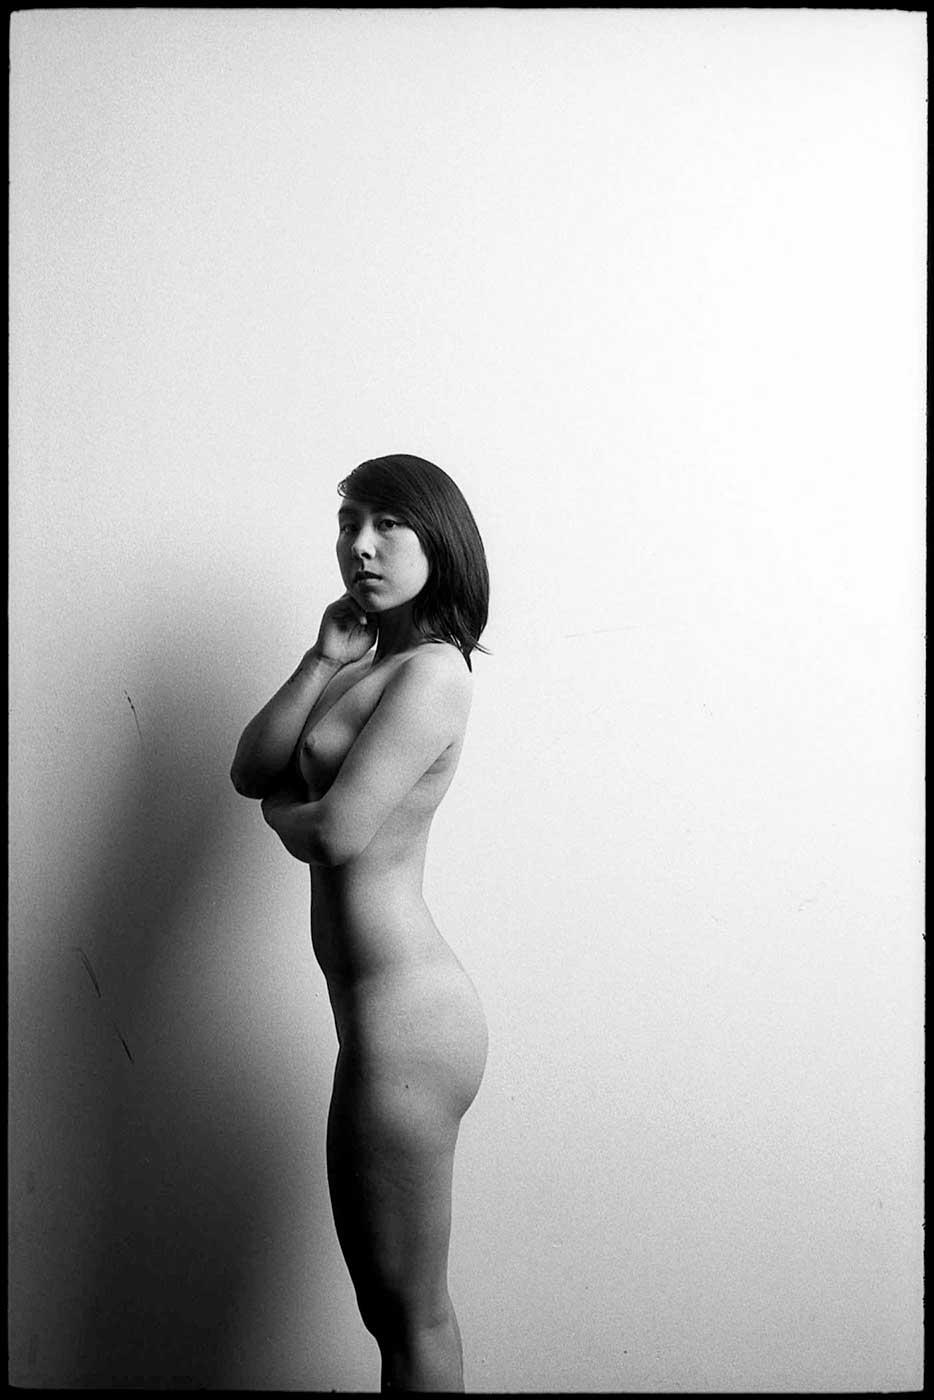 #0328_21A - Adrianna, 2014